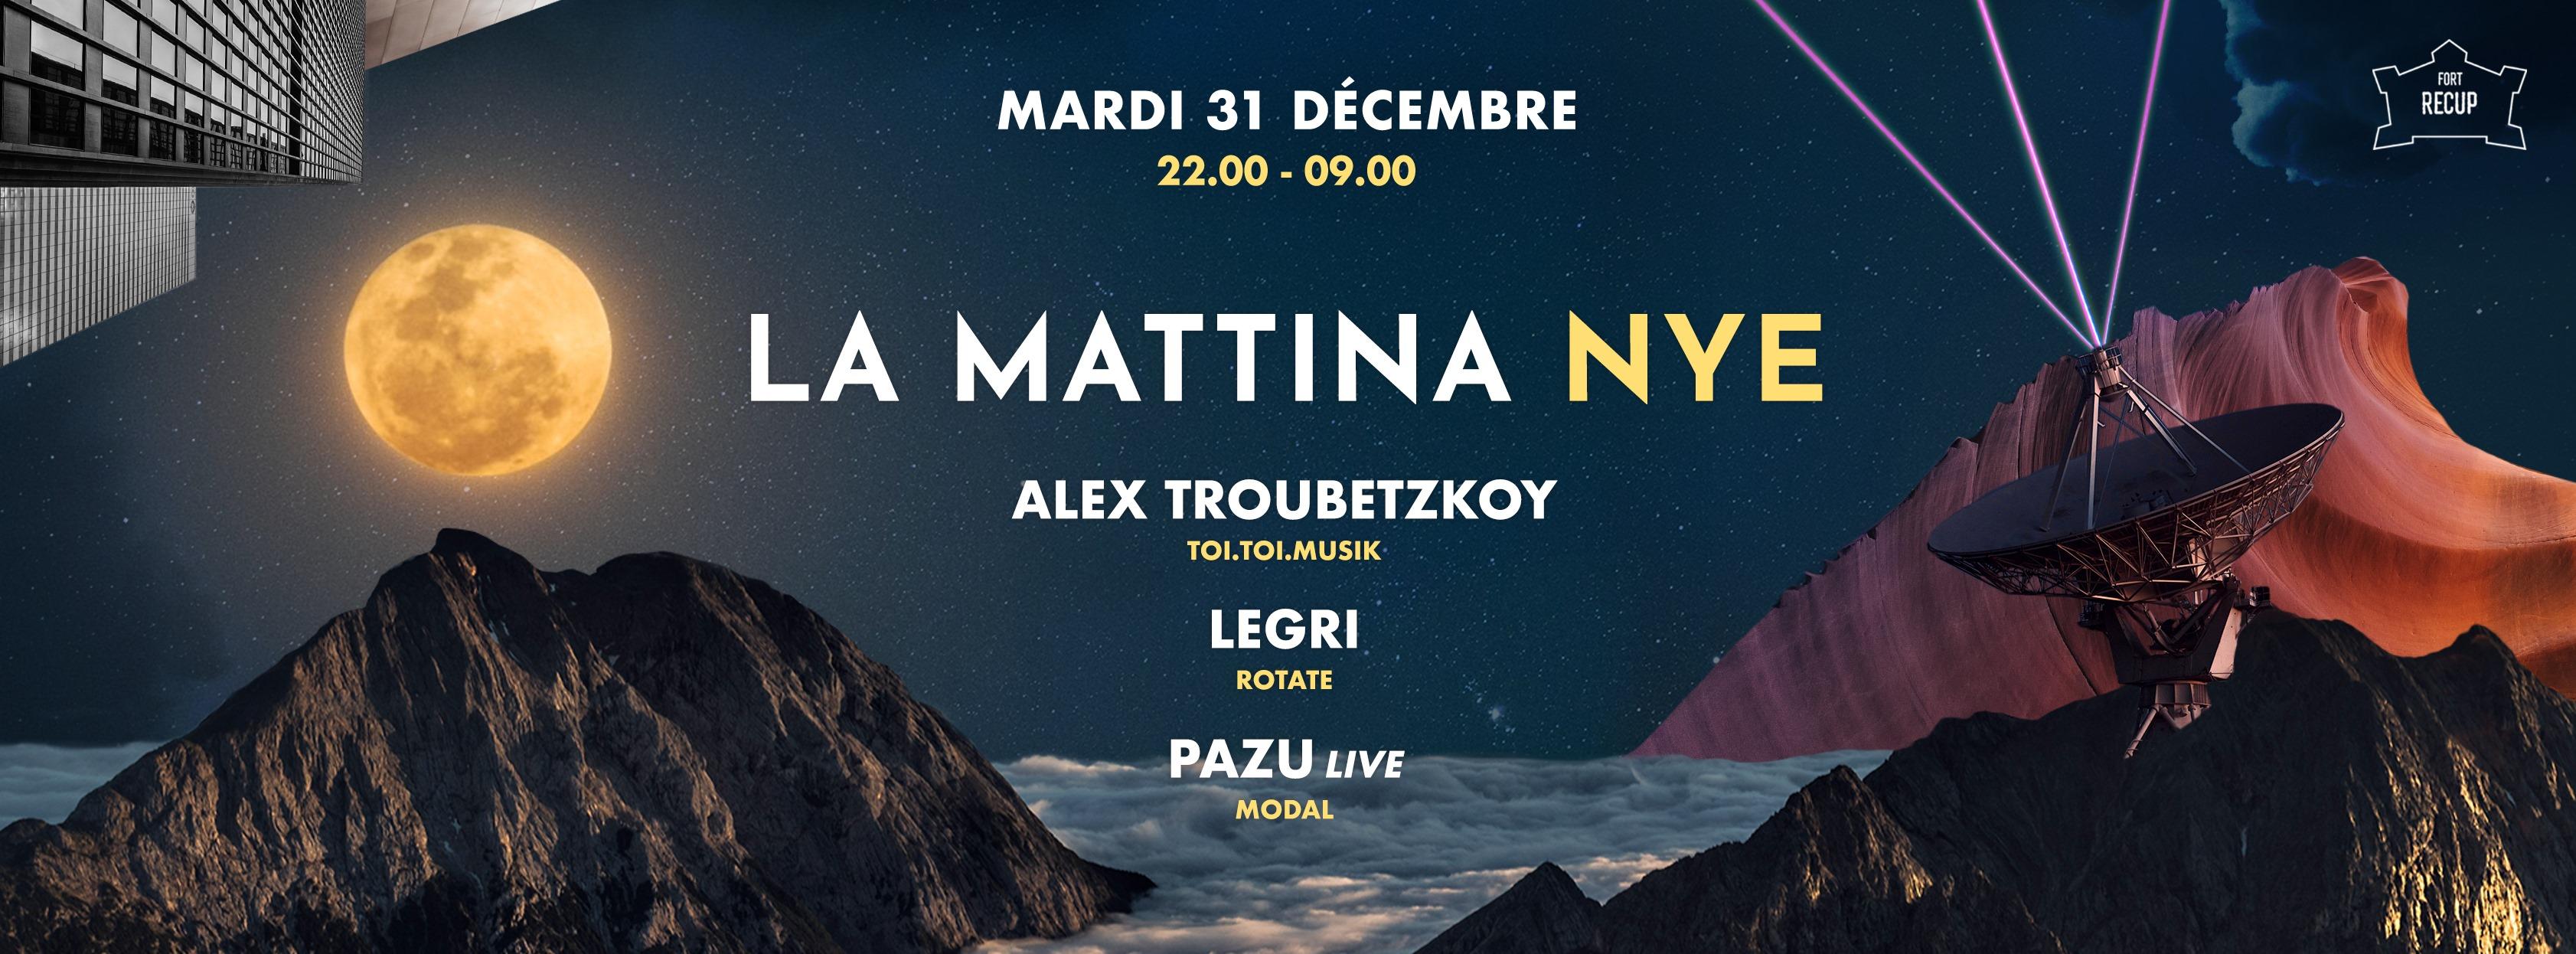 La Mattina NYE ๏ Fort Recup